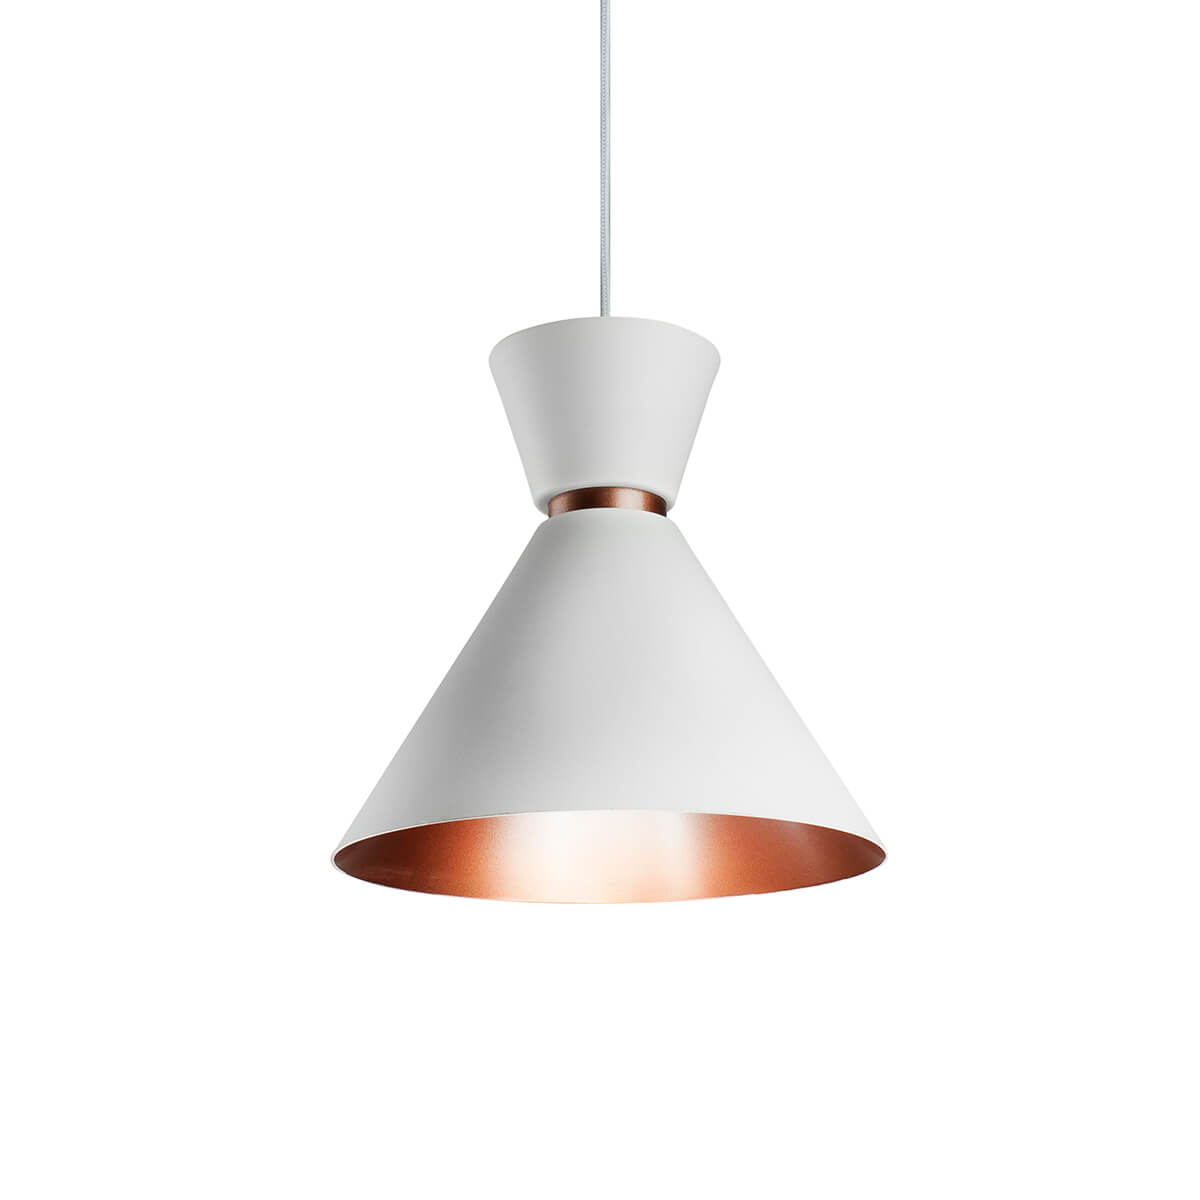 Pendente Alumínio Branco/Cobre - Bambola 23cm Cozinha/Bancada